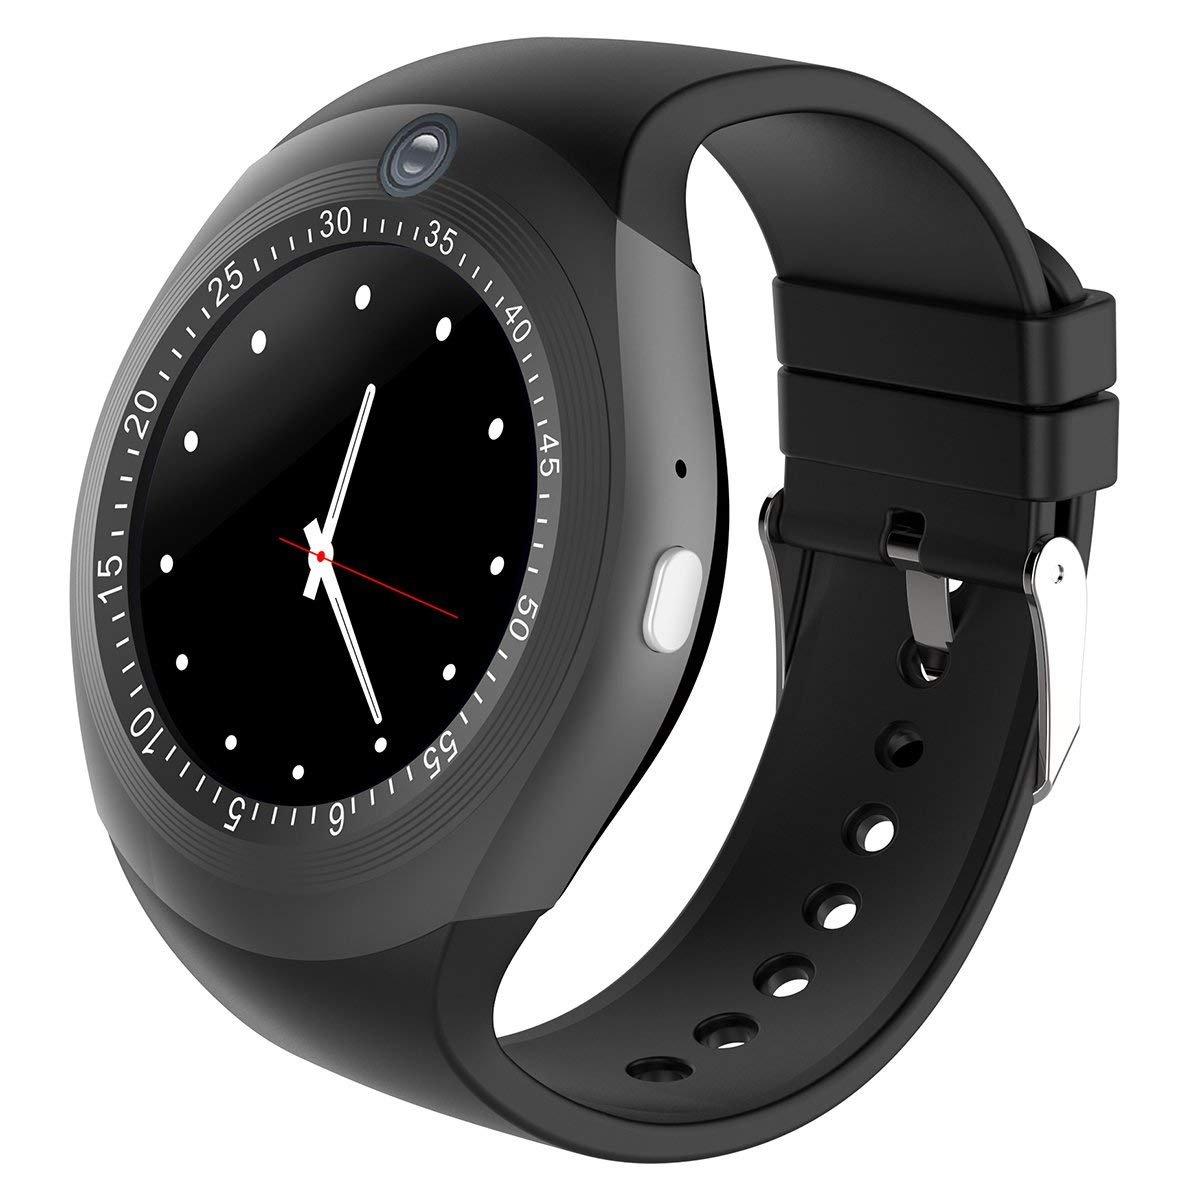 Bluetooth Smart Watch Reloj Inteligente Teléfono Inteligente Pantalla Táctil con Ranura para Tarjeta SIM/sedentario Recordatorio/Pedómetro para Android ...